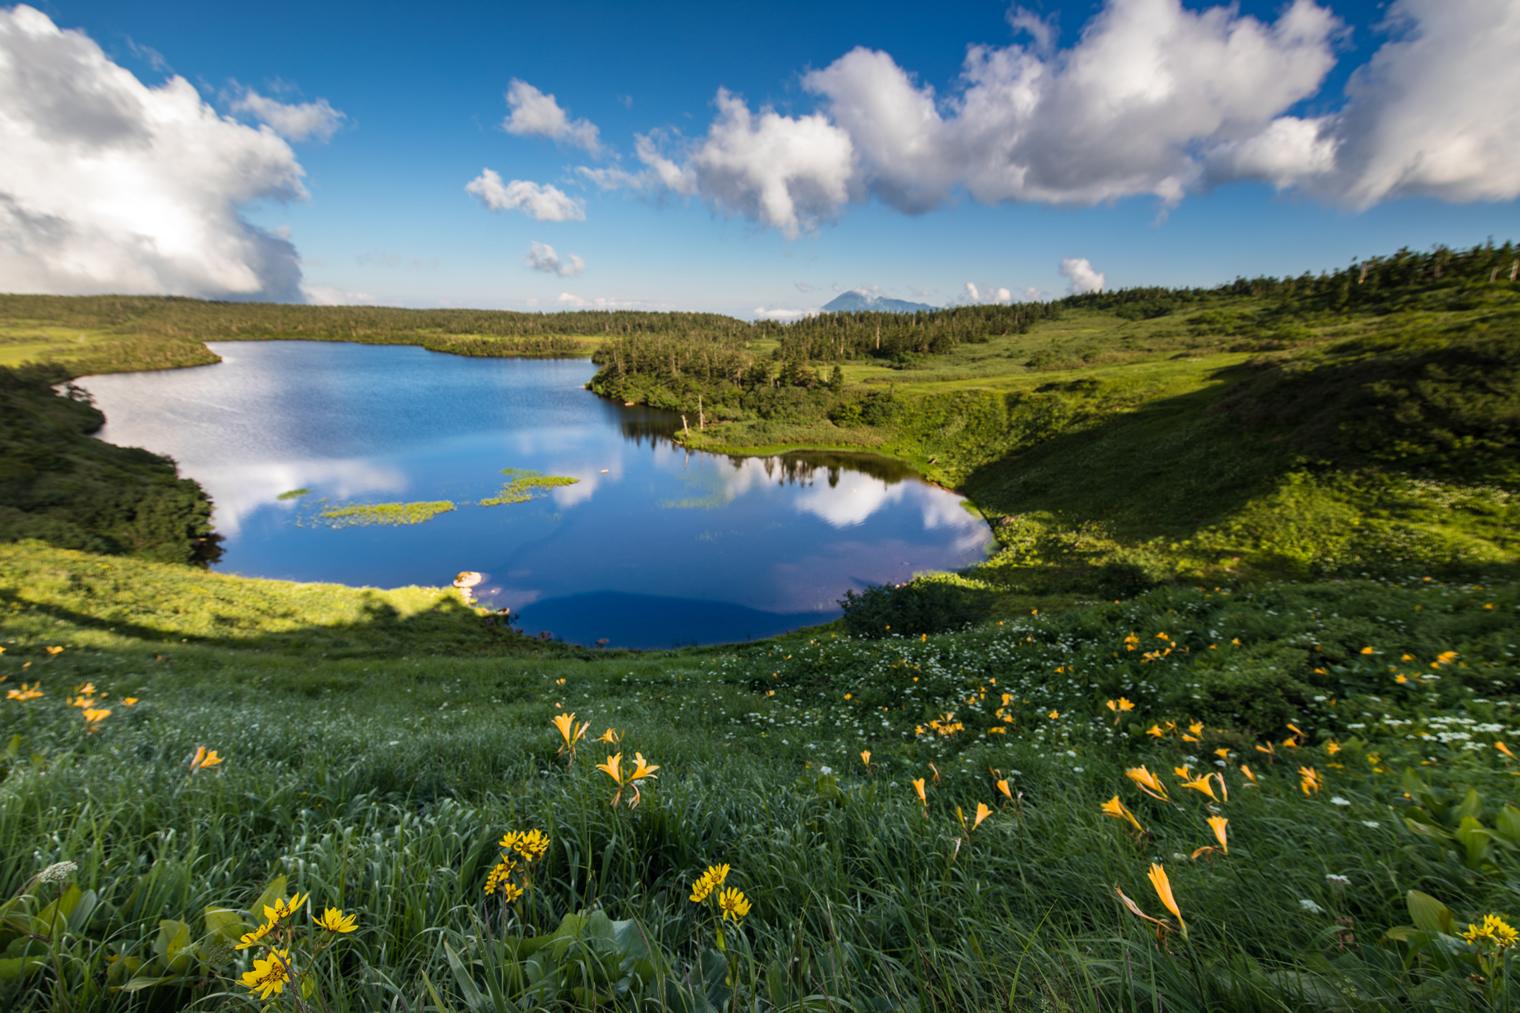 Hachiman Lake (Hachiman-numa) at the top of Mount Hachimantai. Photo by Hachimantai DMO